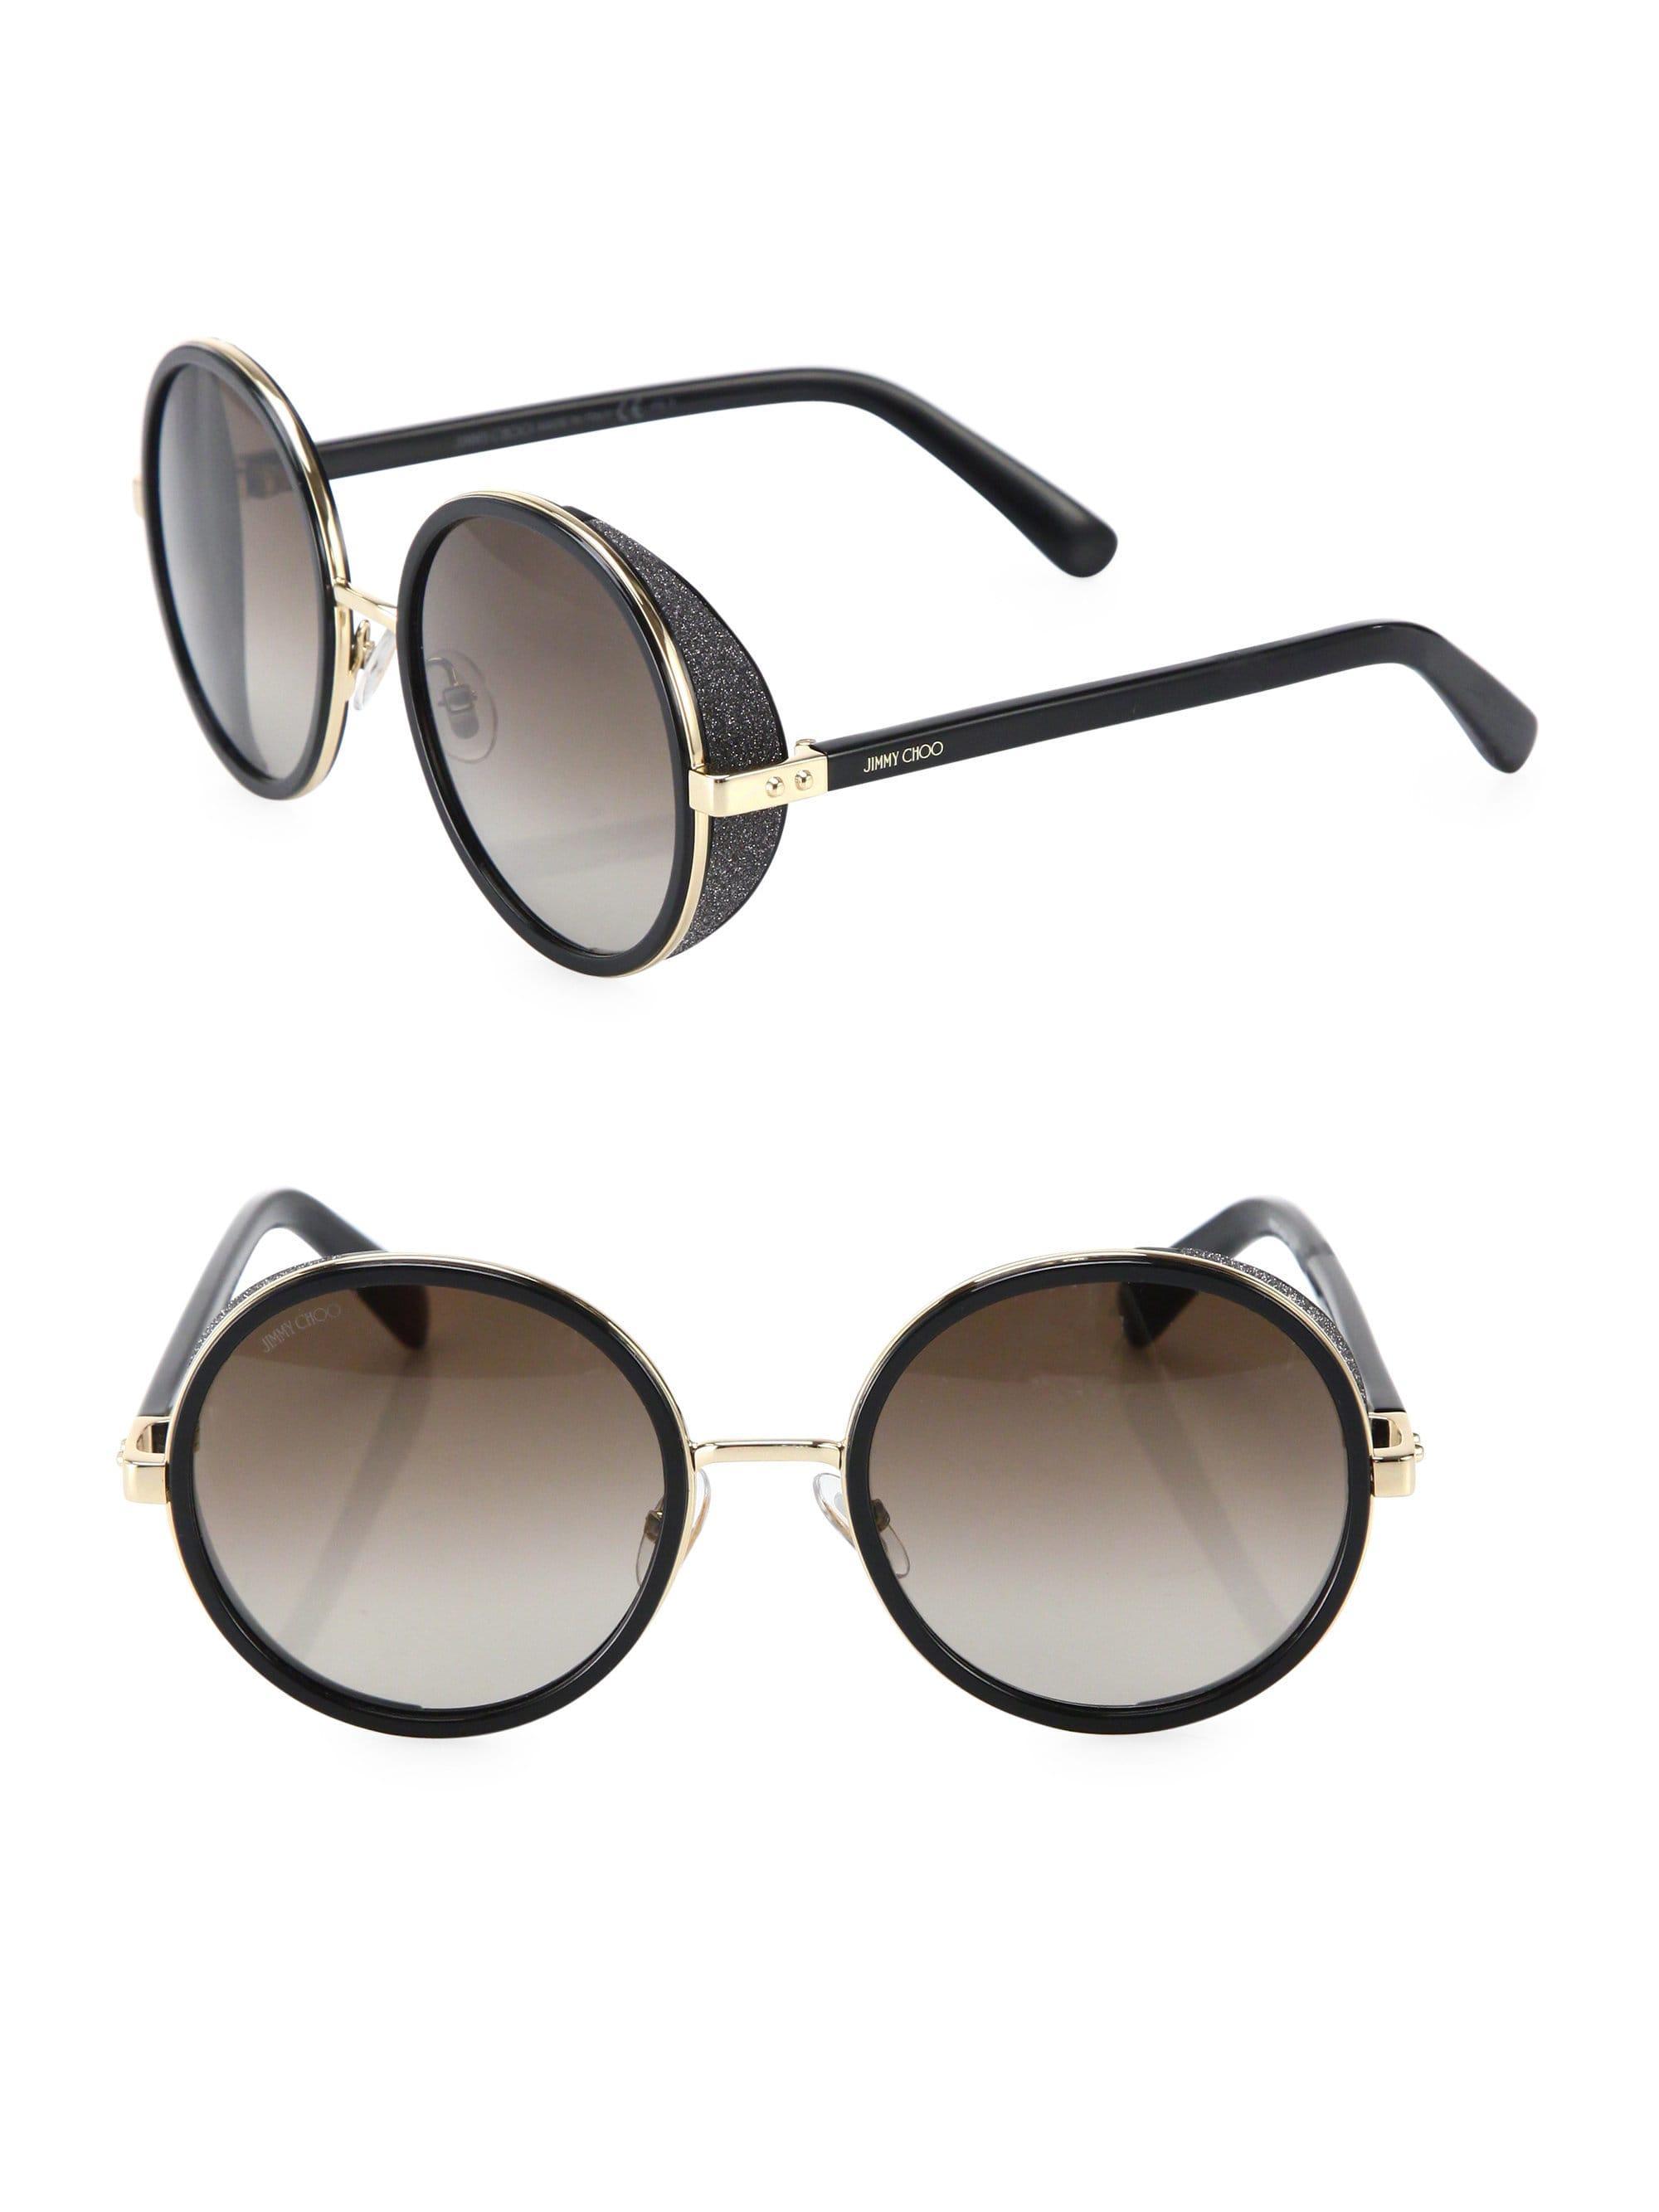 da11cbecb0b Lyst - Jimmy Choo Women s 54mm Andie Glitter-trim Round Sunglasses ...